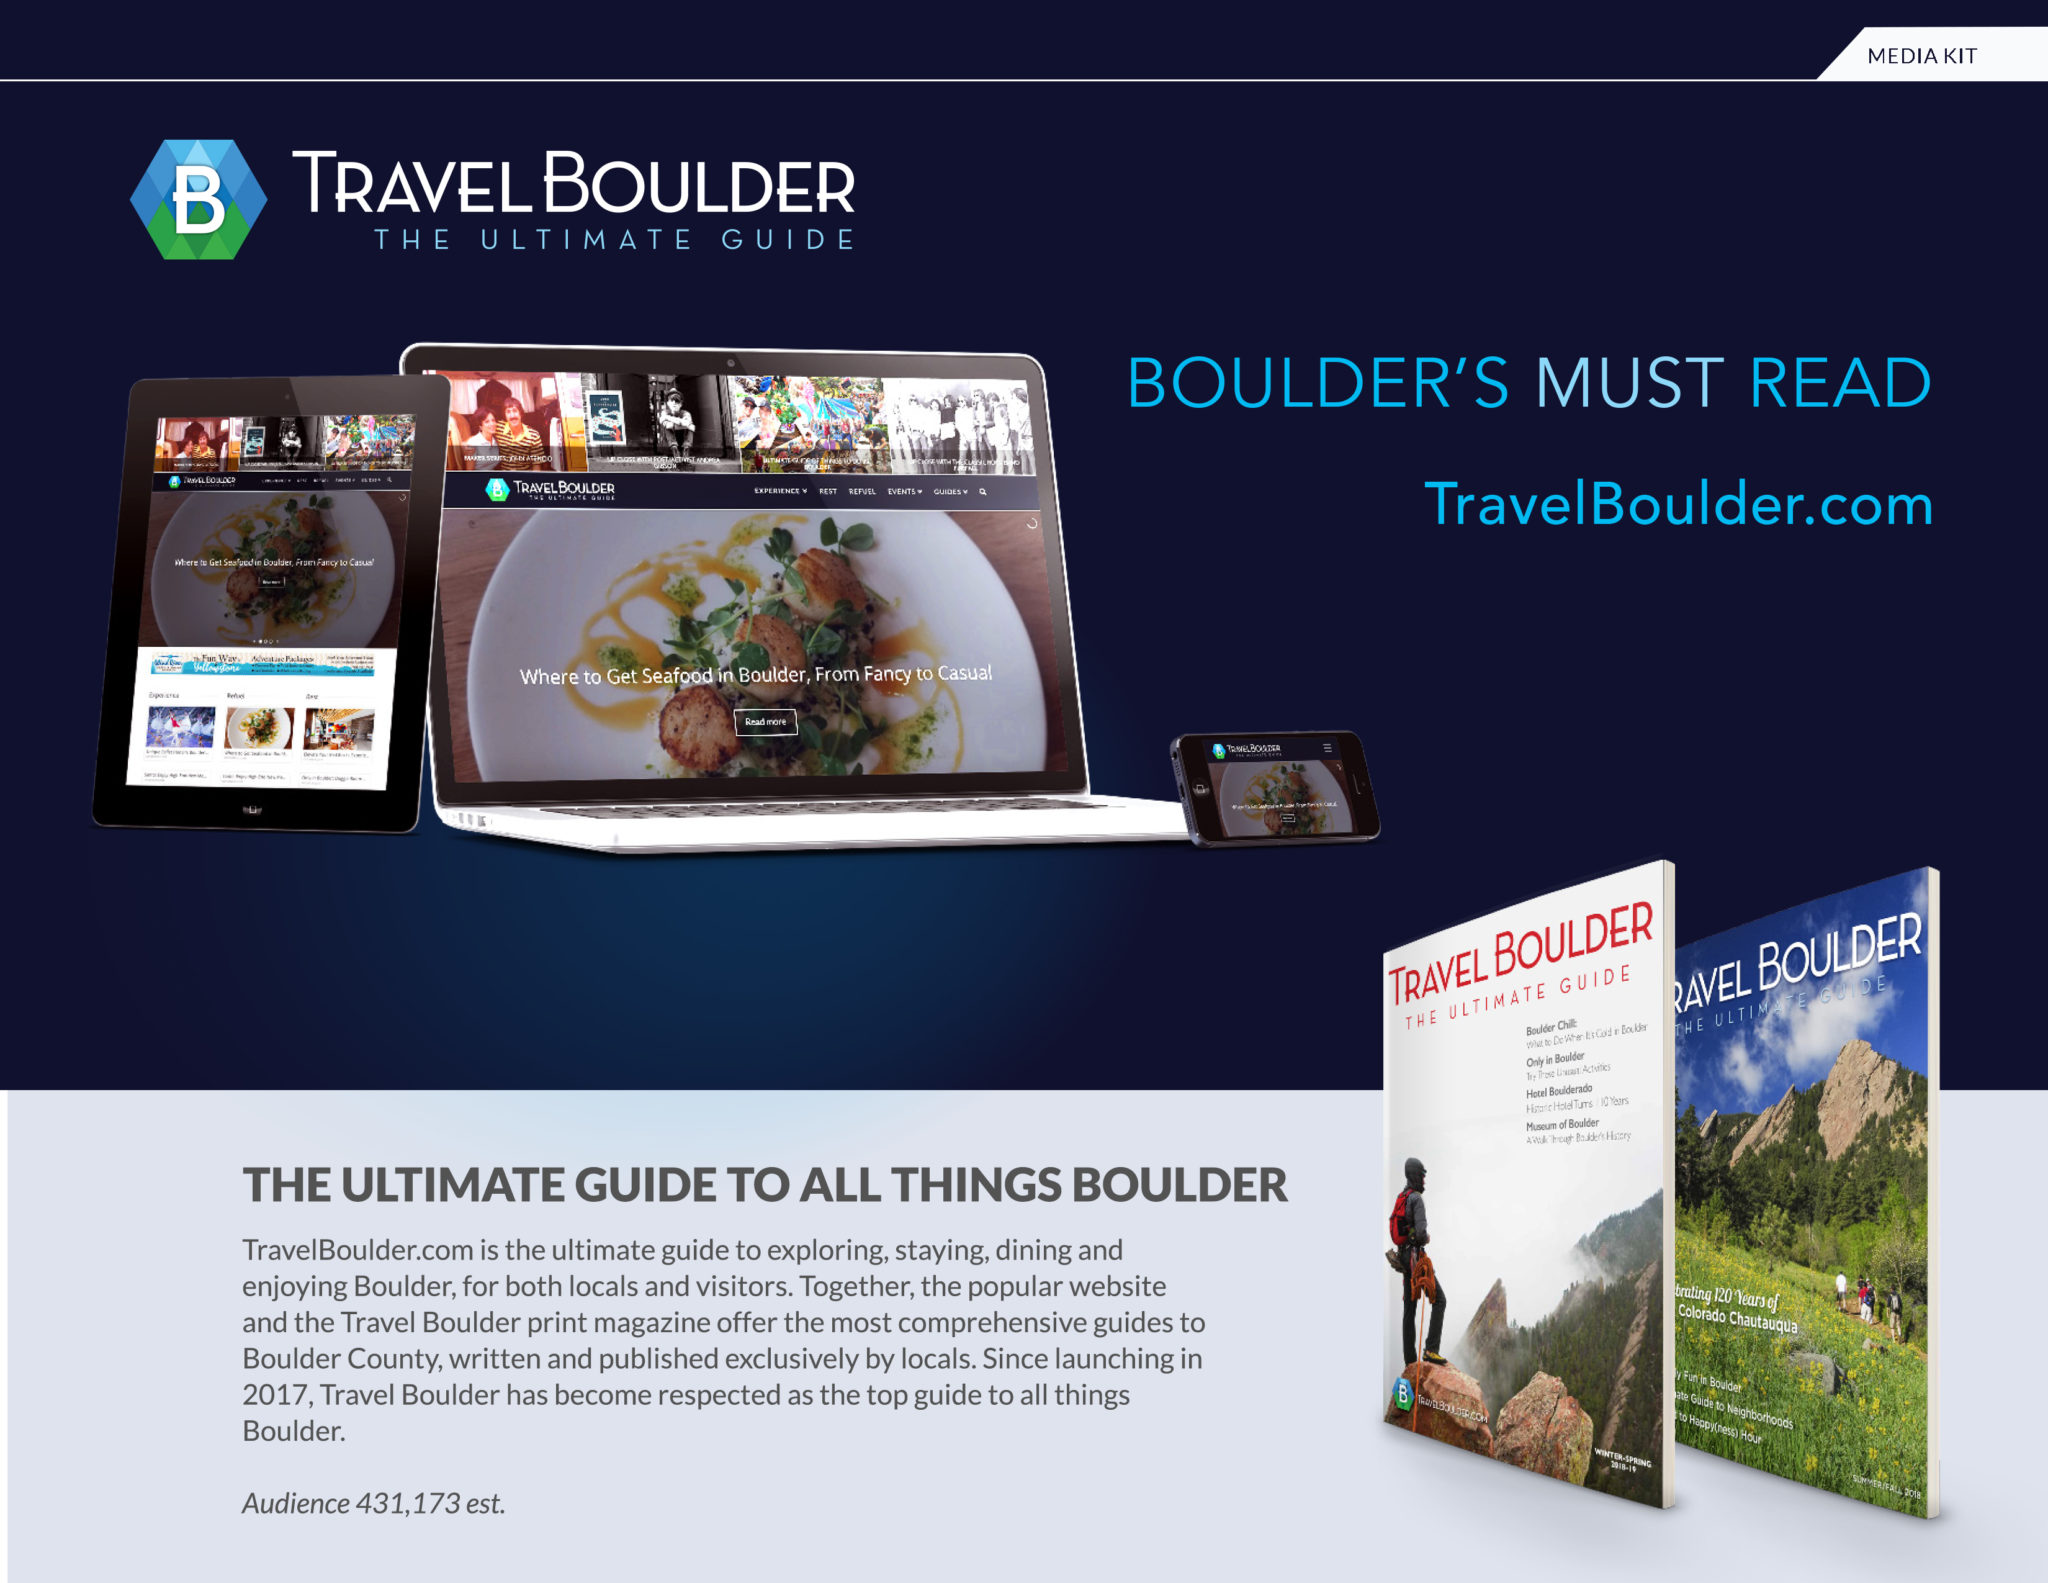 Travel Boulder Media Kit